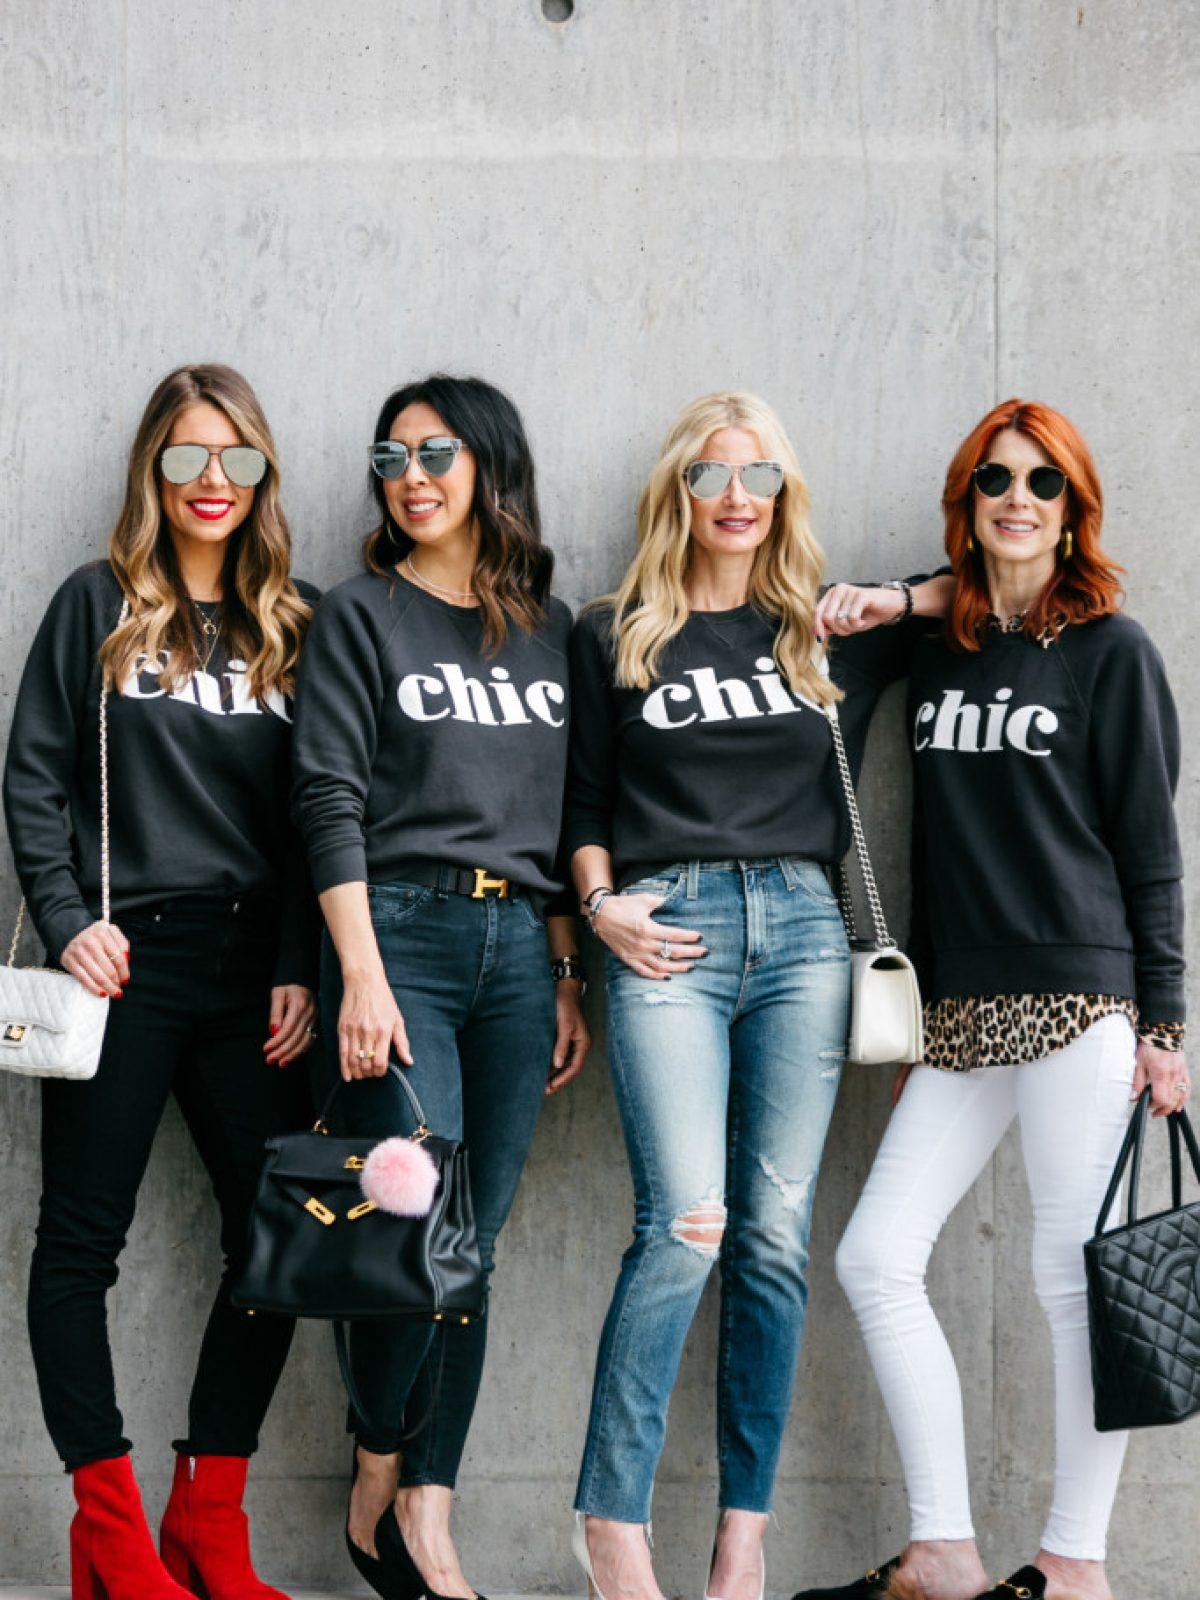 chic_1-187